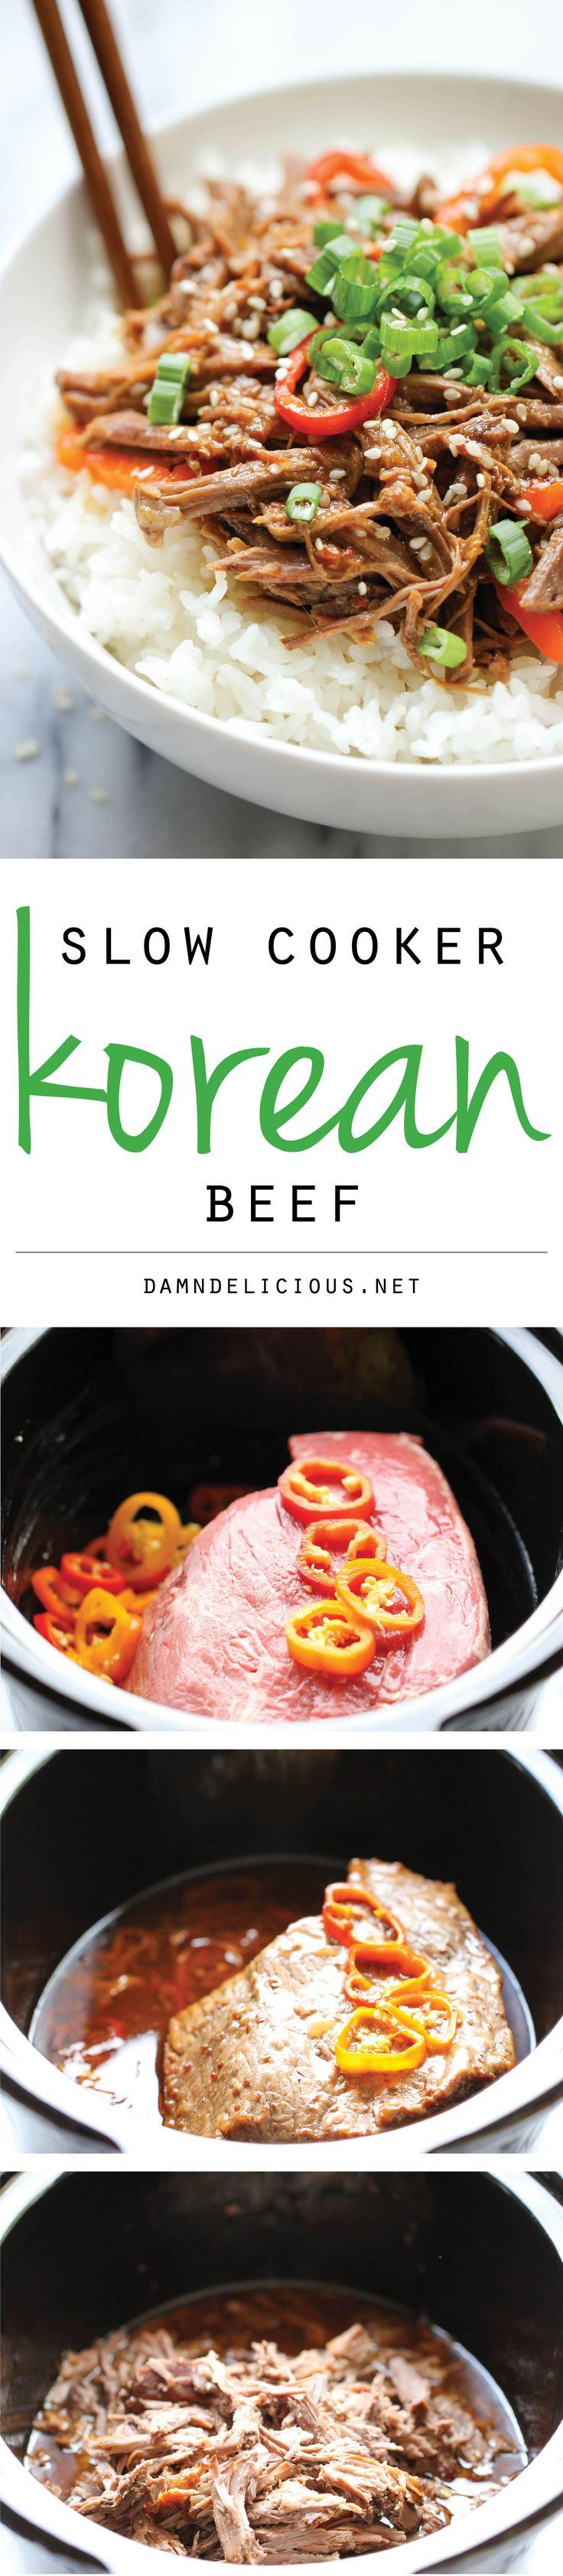 Slow Cooker Korean Beef - Amazingly tender, flavorful Korean beef made right in the slow cooker with just 3 ingredients and 5 min prep!